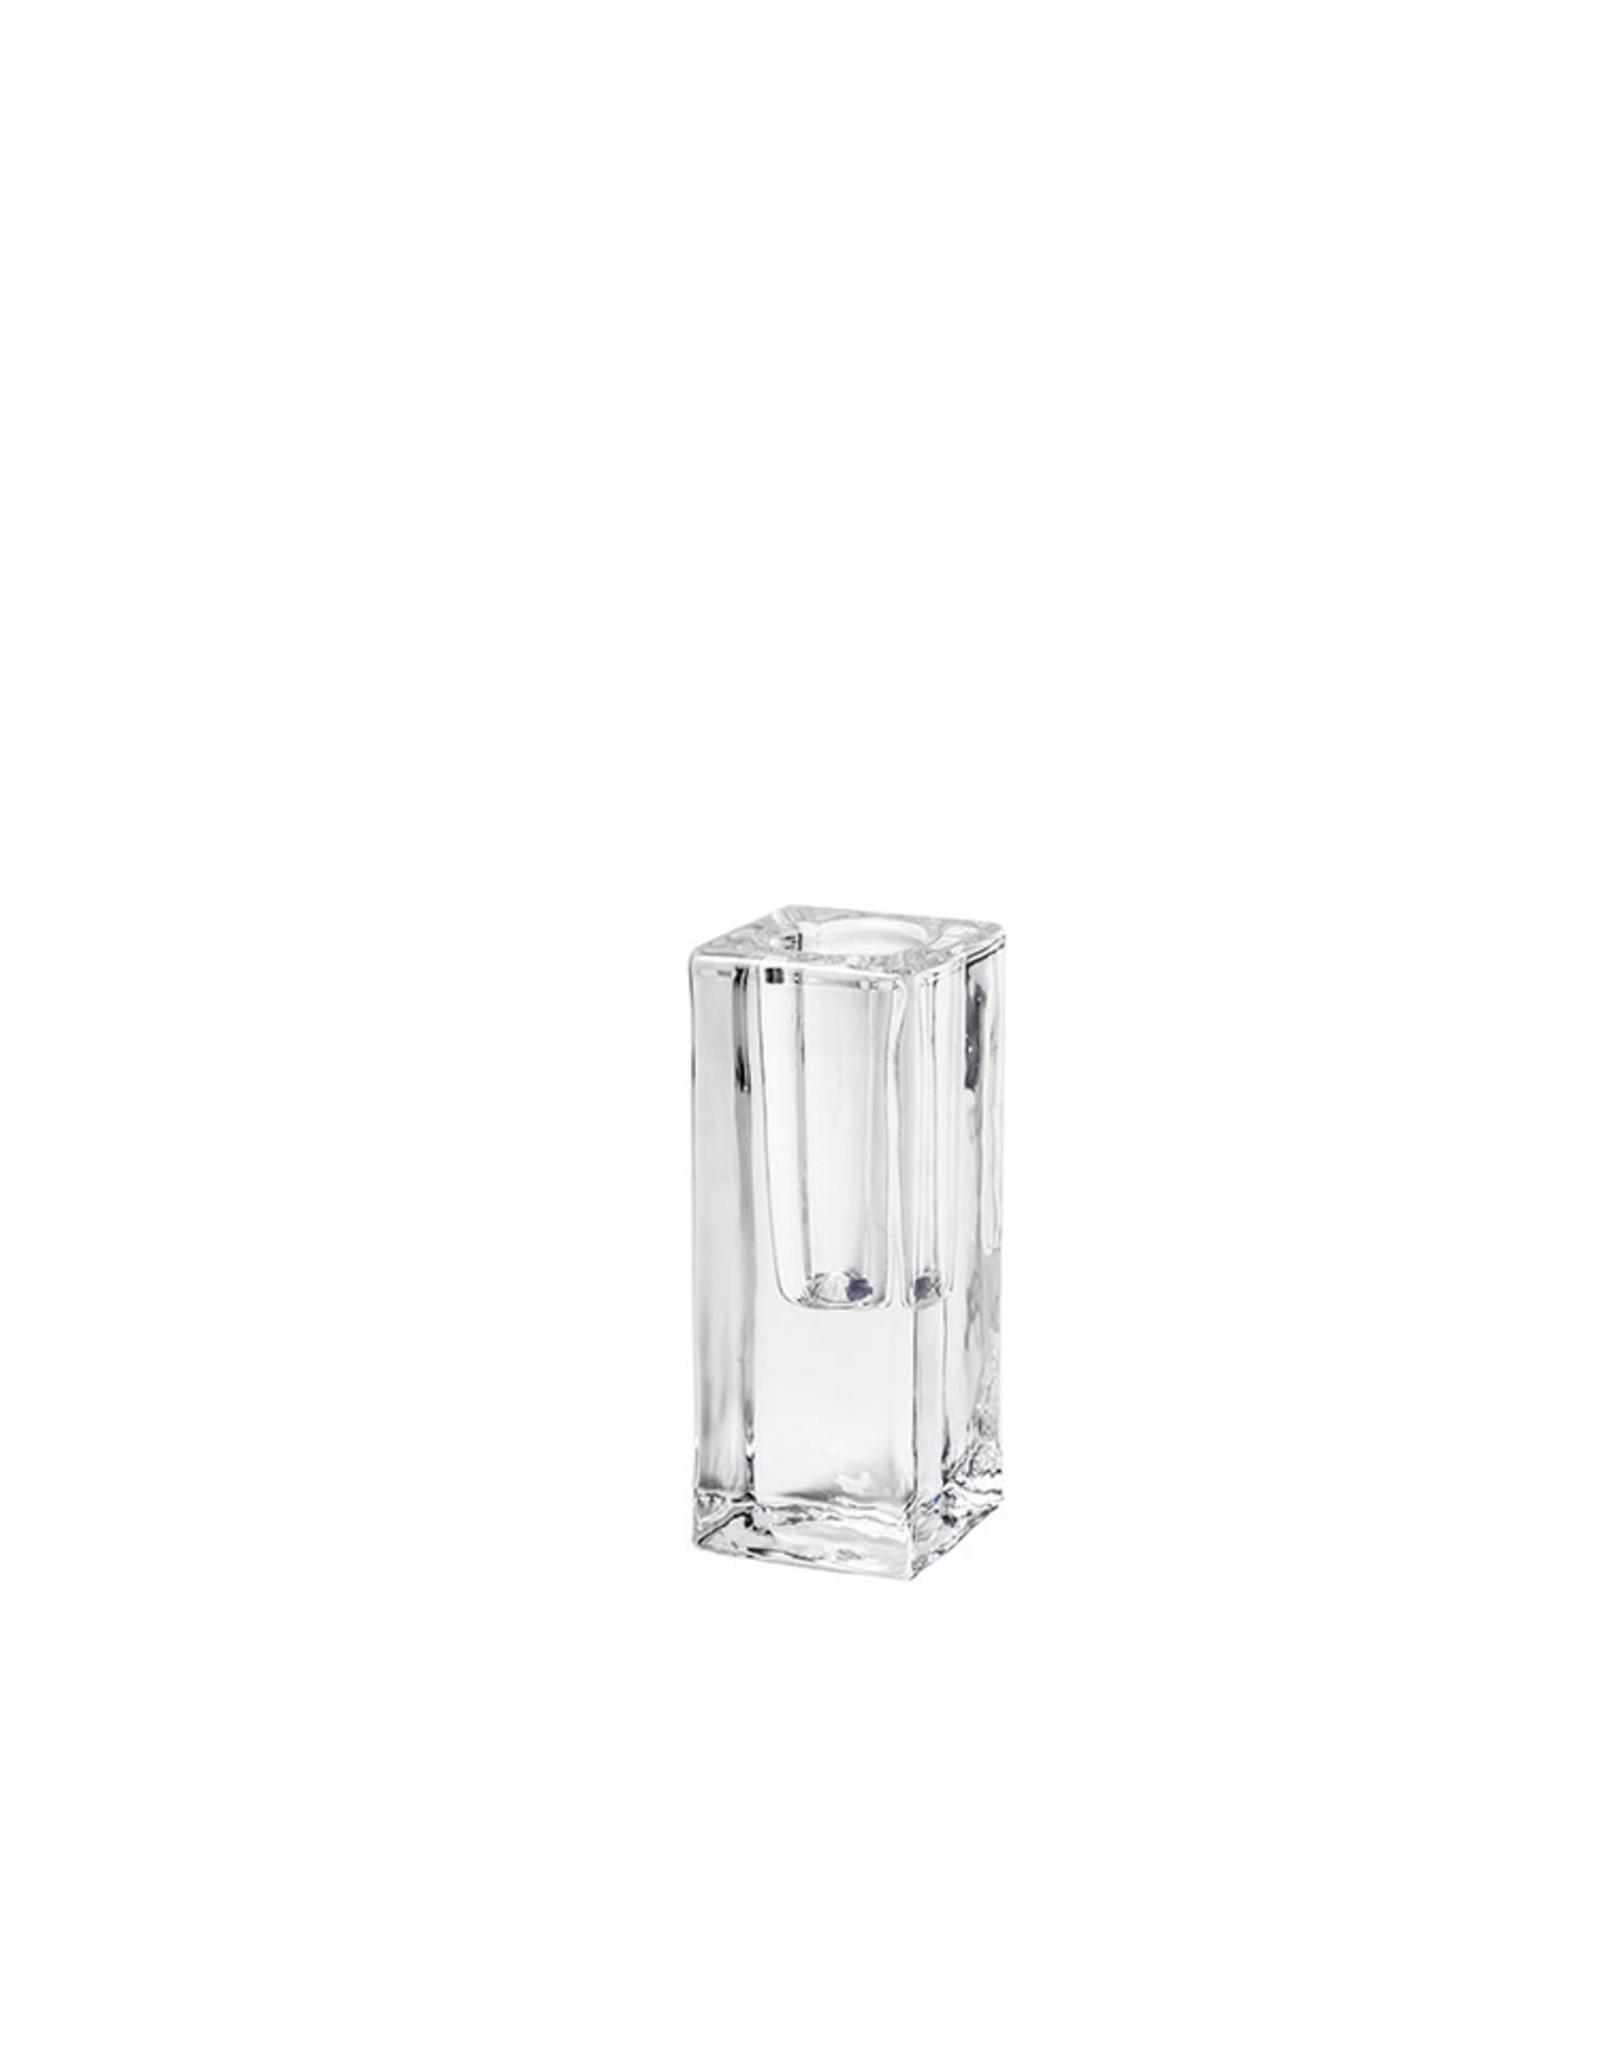 Rustik Lys Kandelaar Classic L - Ø 4 x H 10 cm - Glas